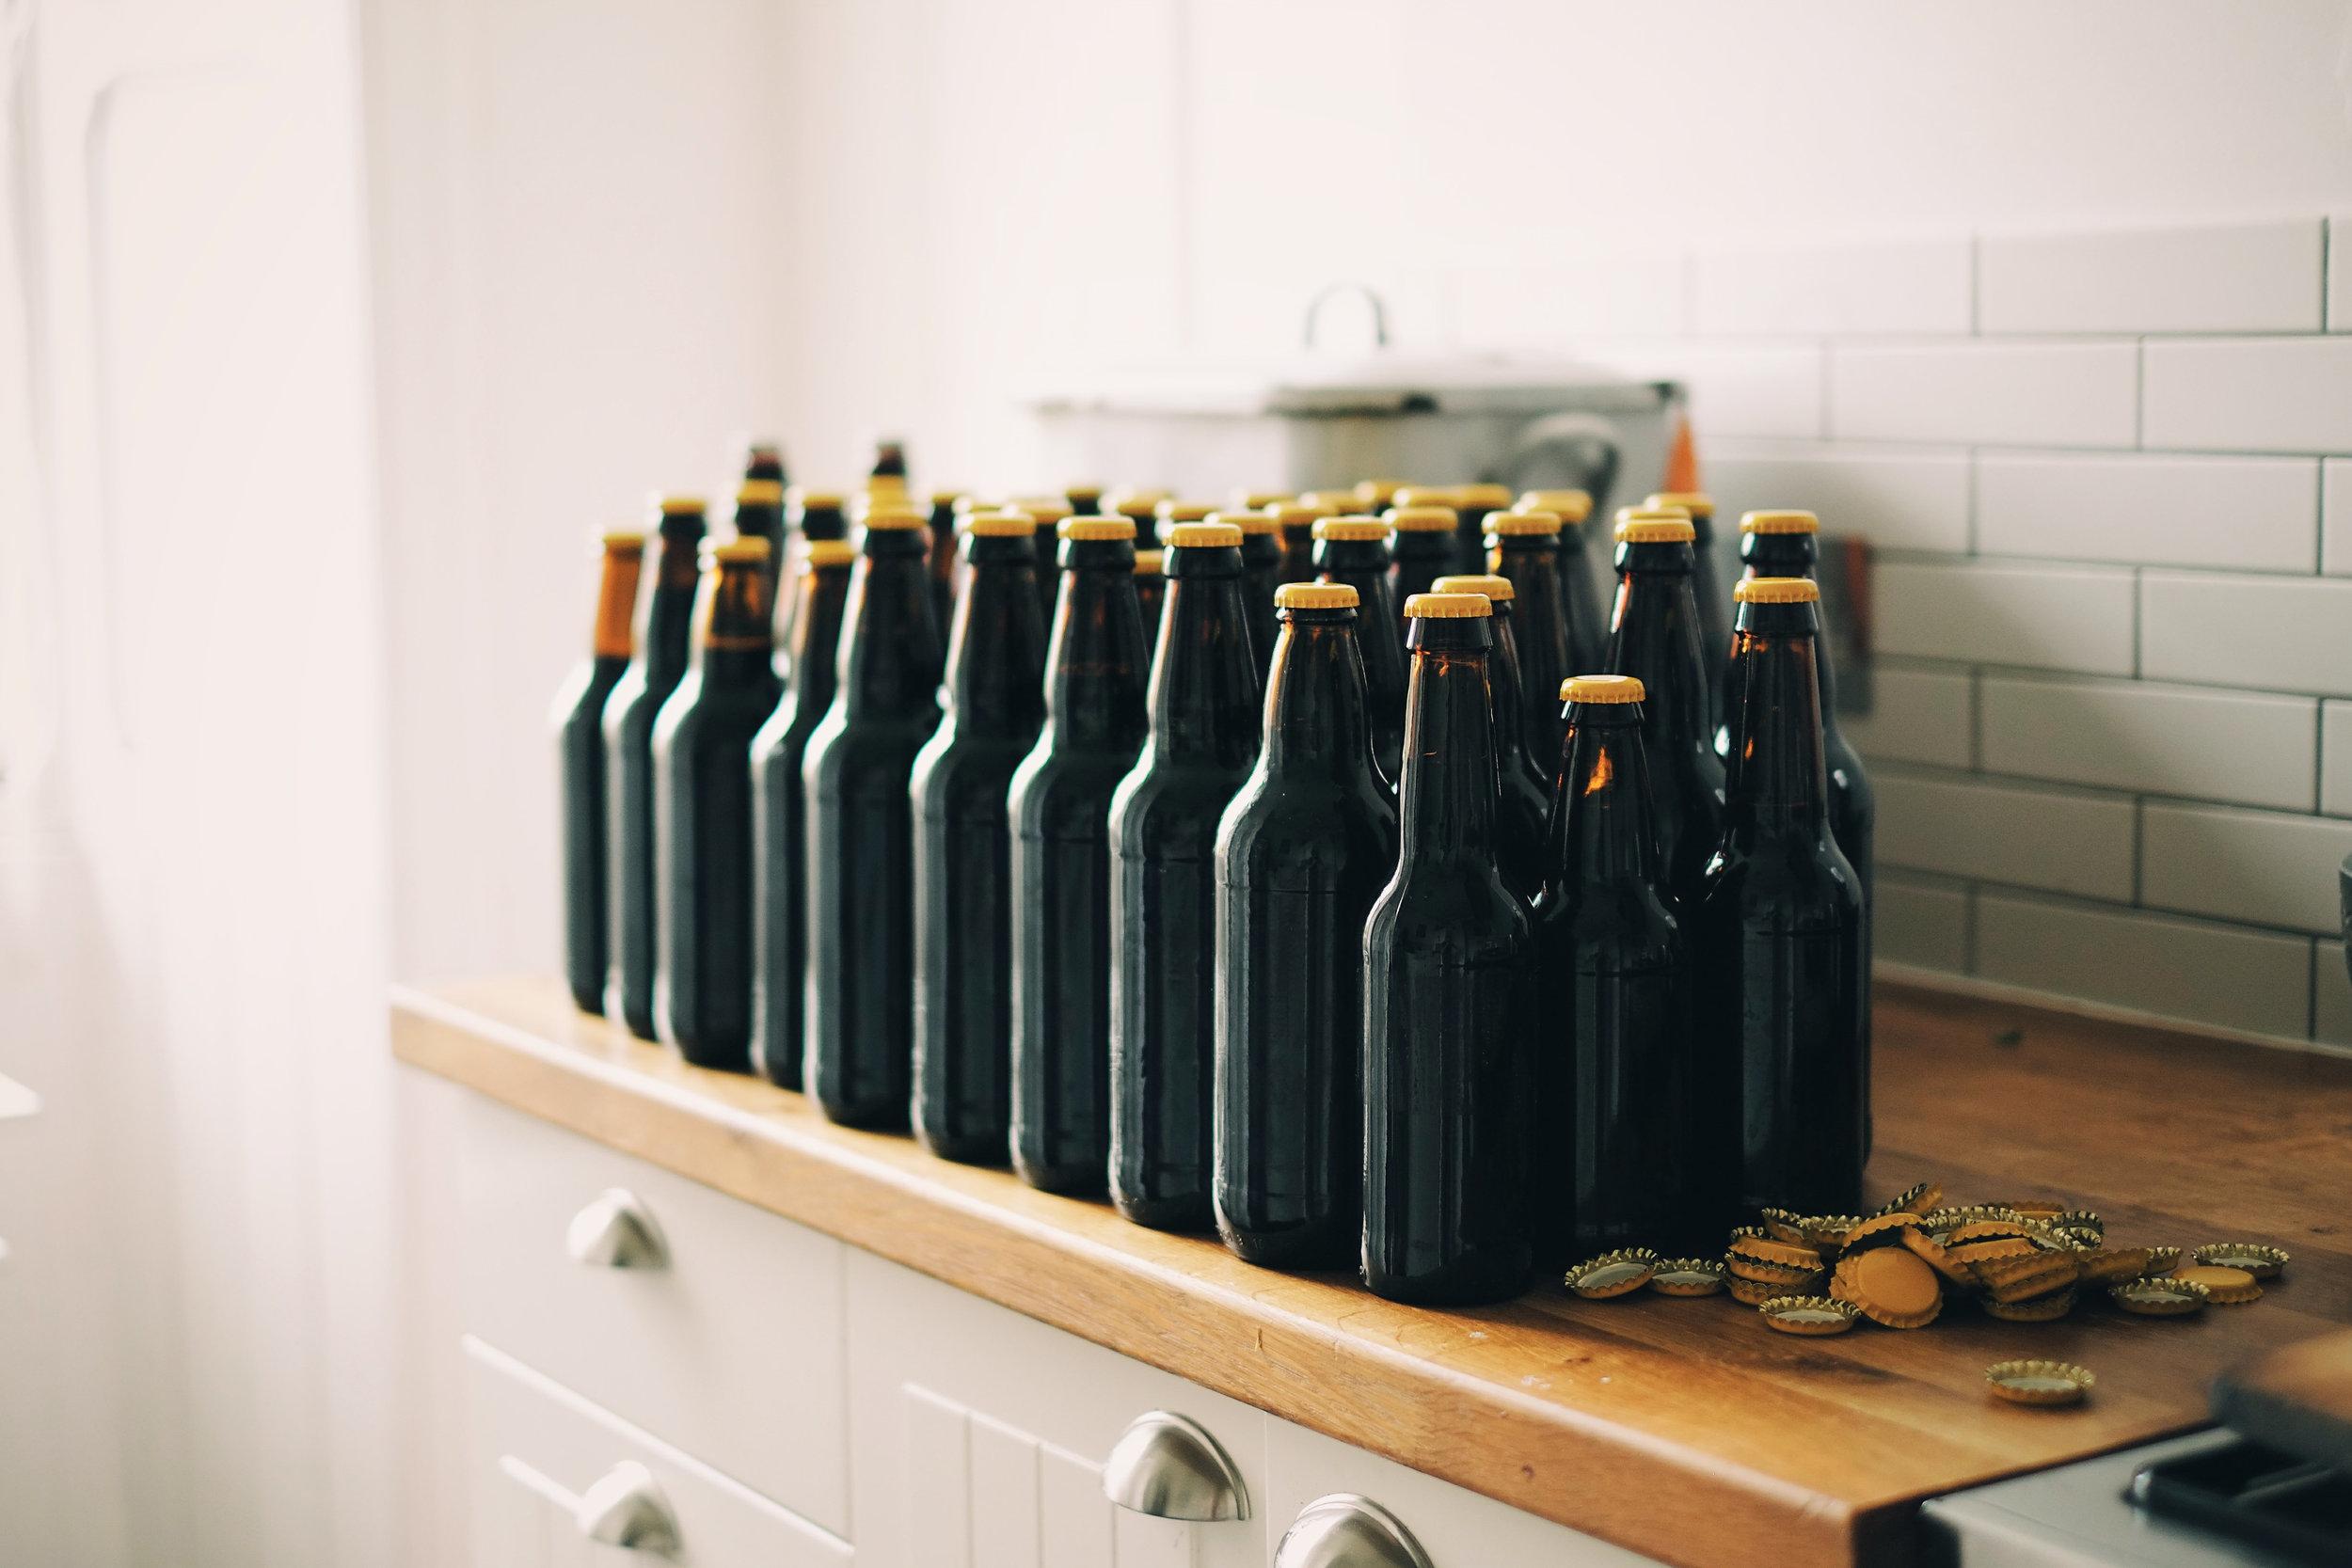 adam-wilson-138927_bottles.jpg